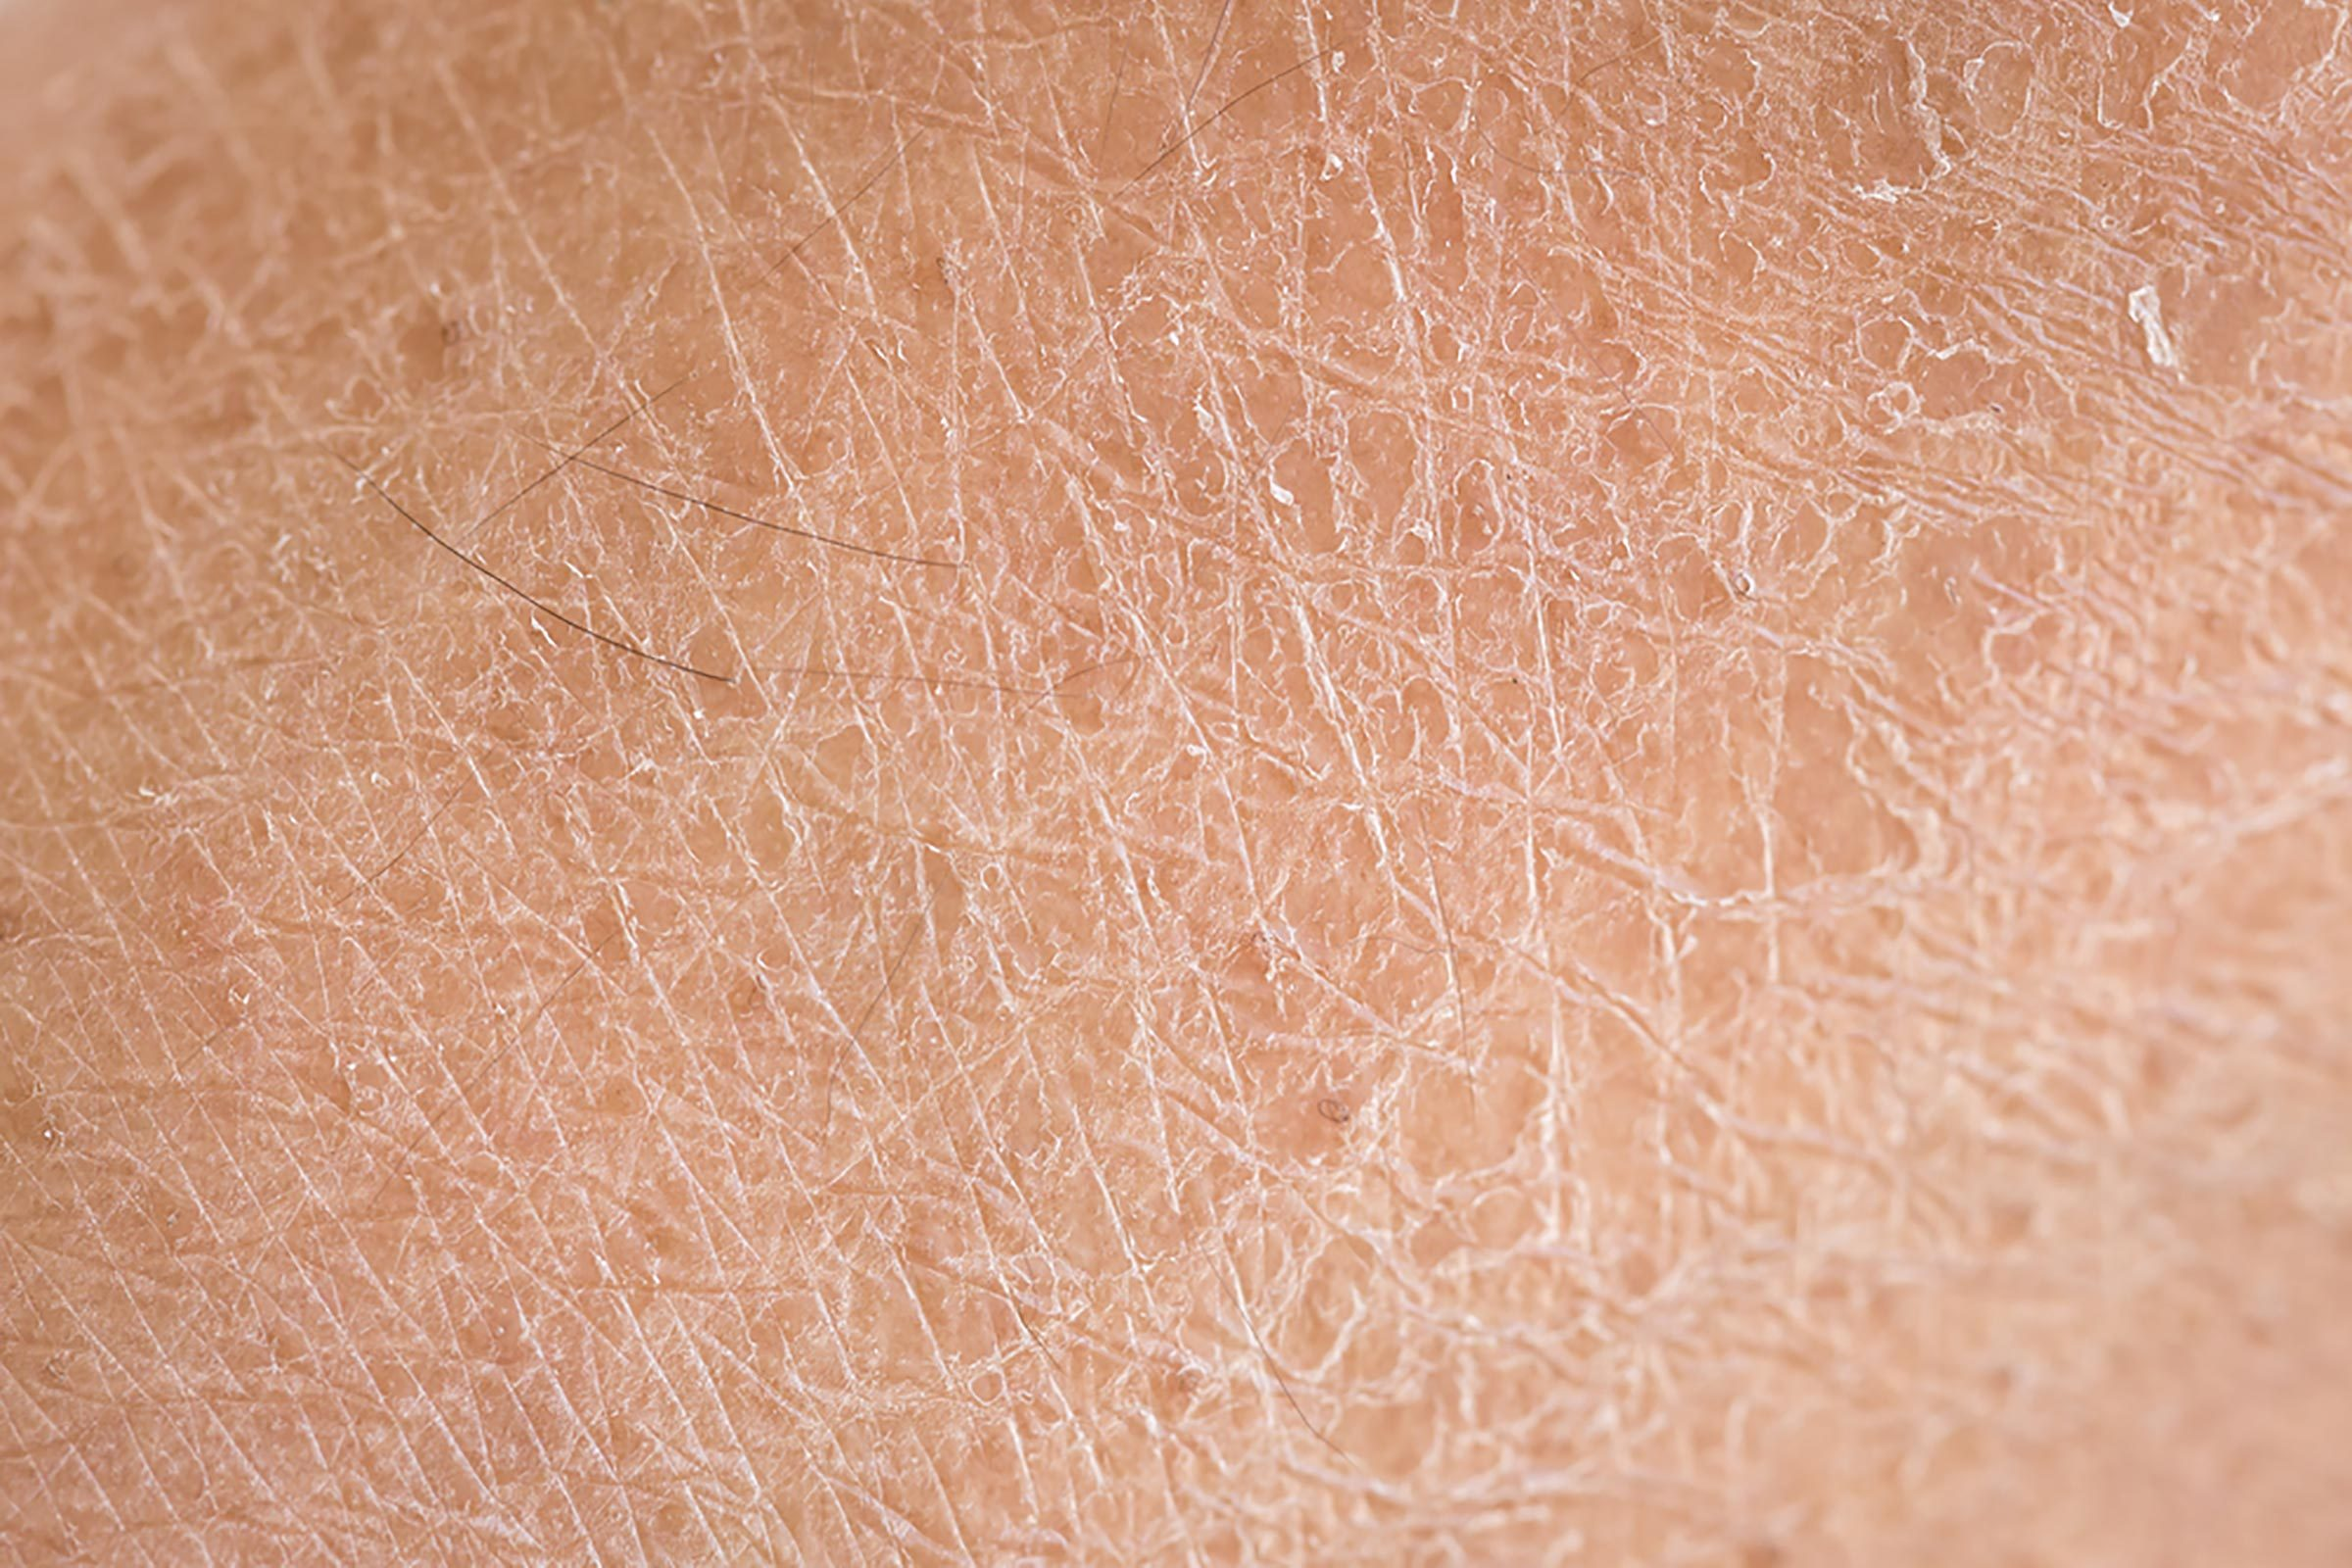 Cracked, dry skin.